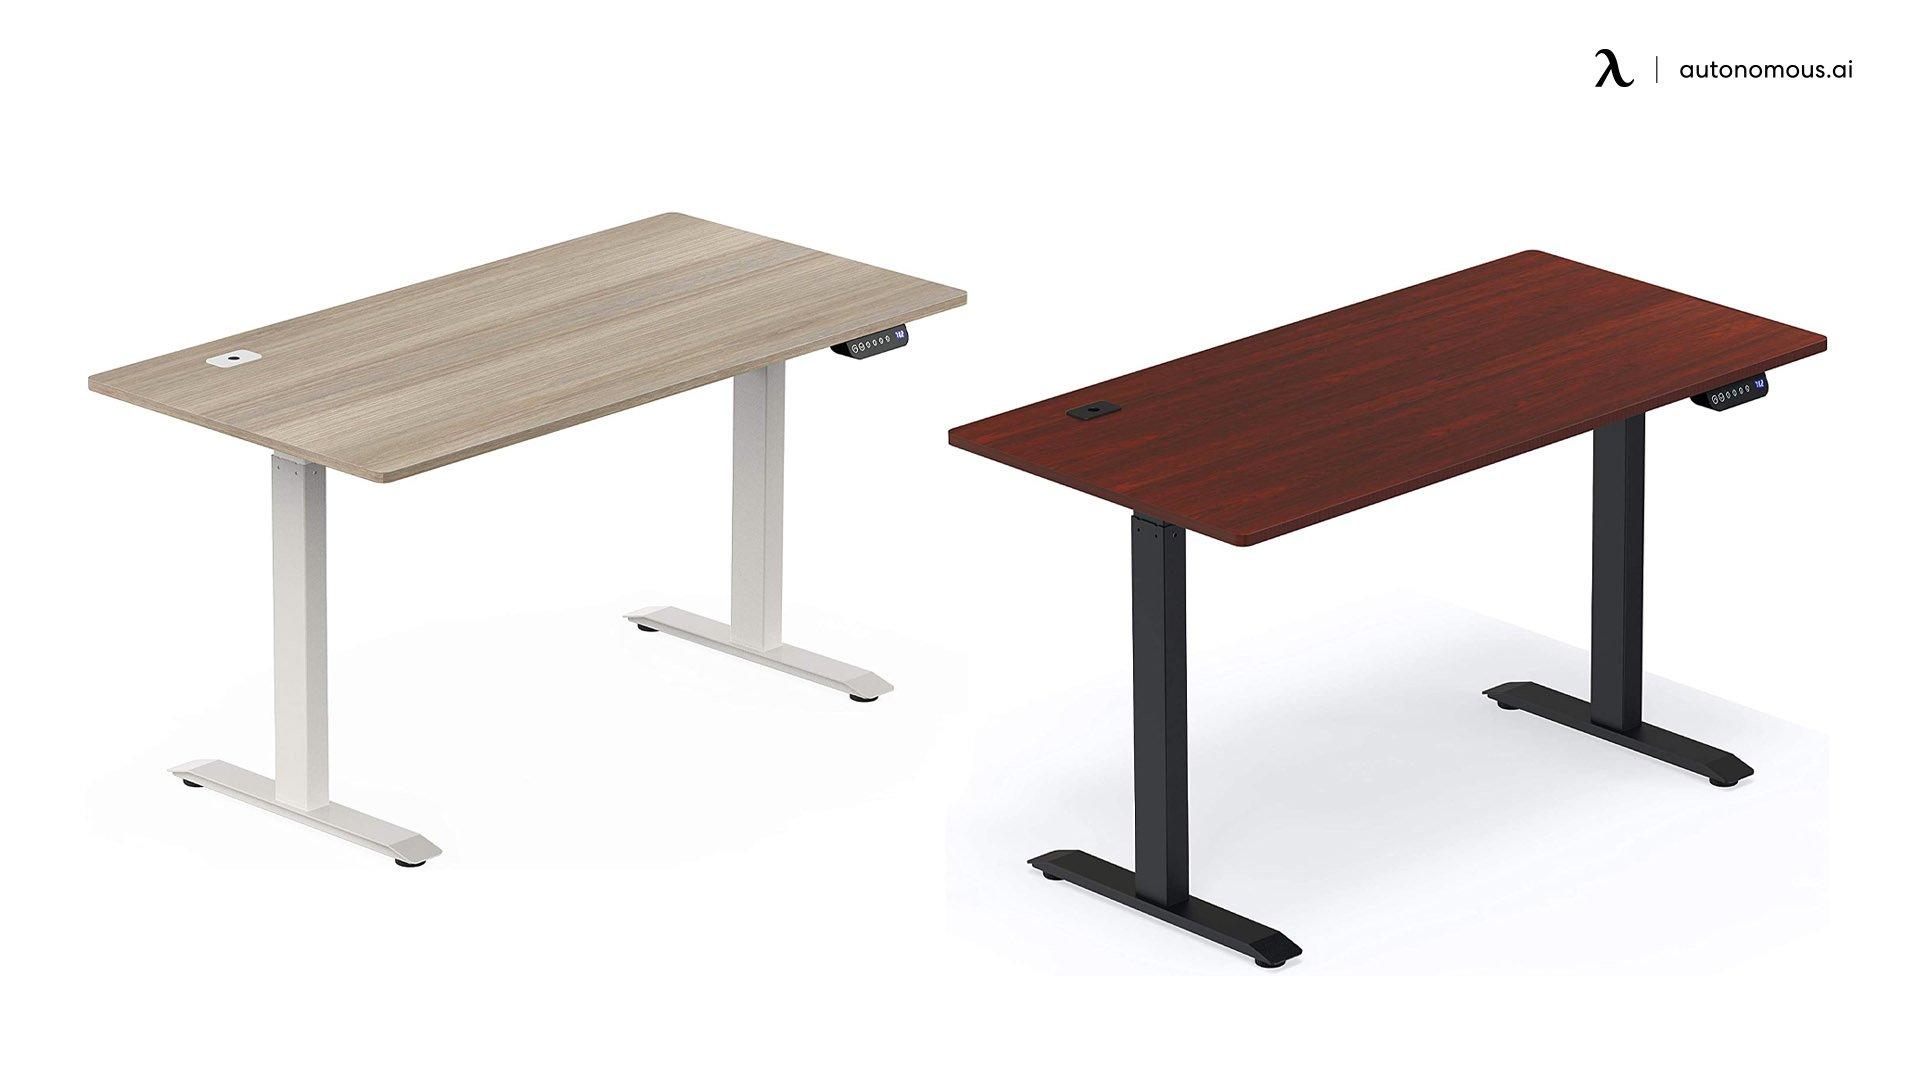 SHW Electric reclaimed wood Adjustable desk